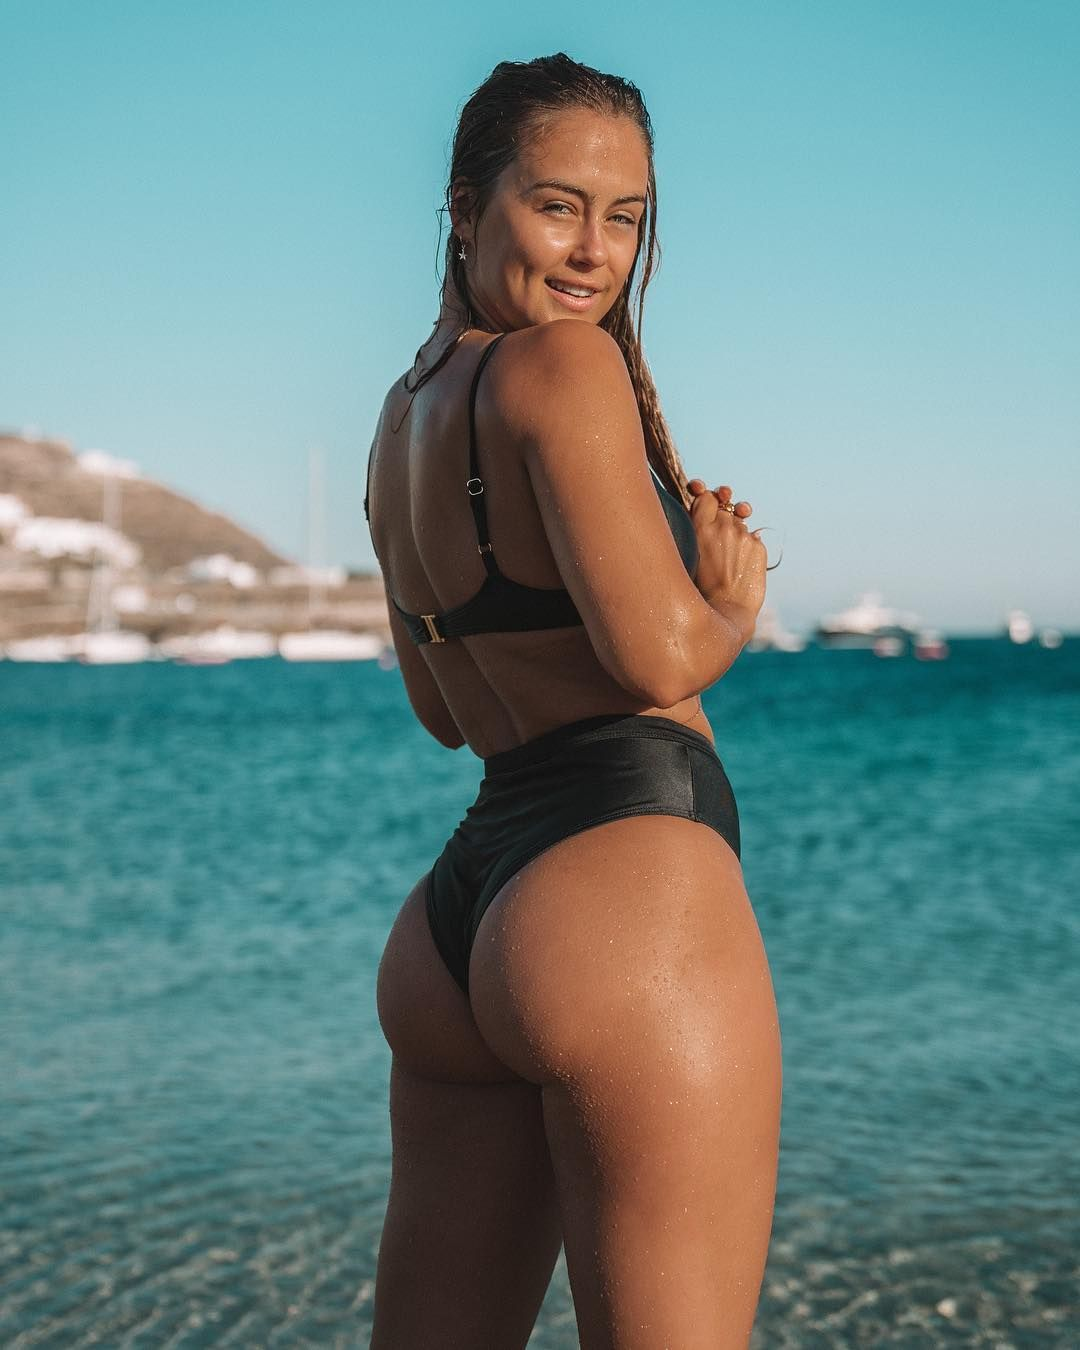 Erotica Steph Claire Smith nude photos 2019